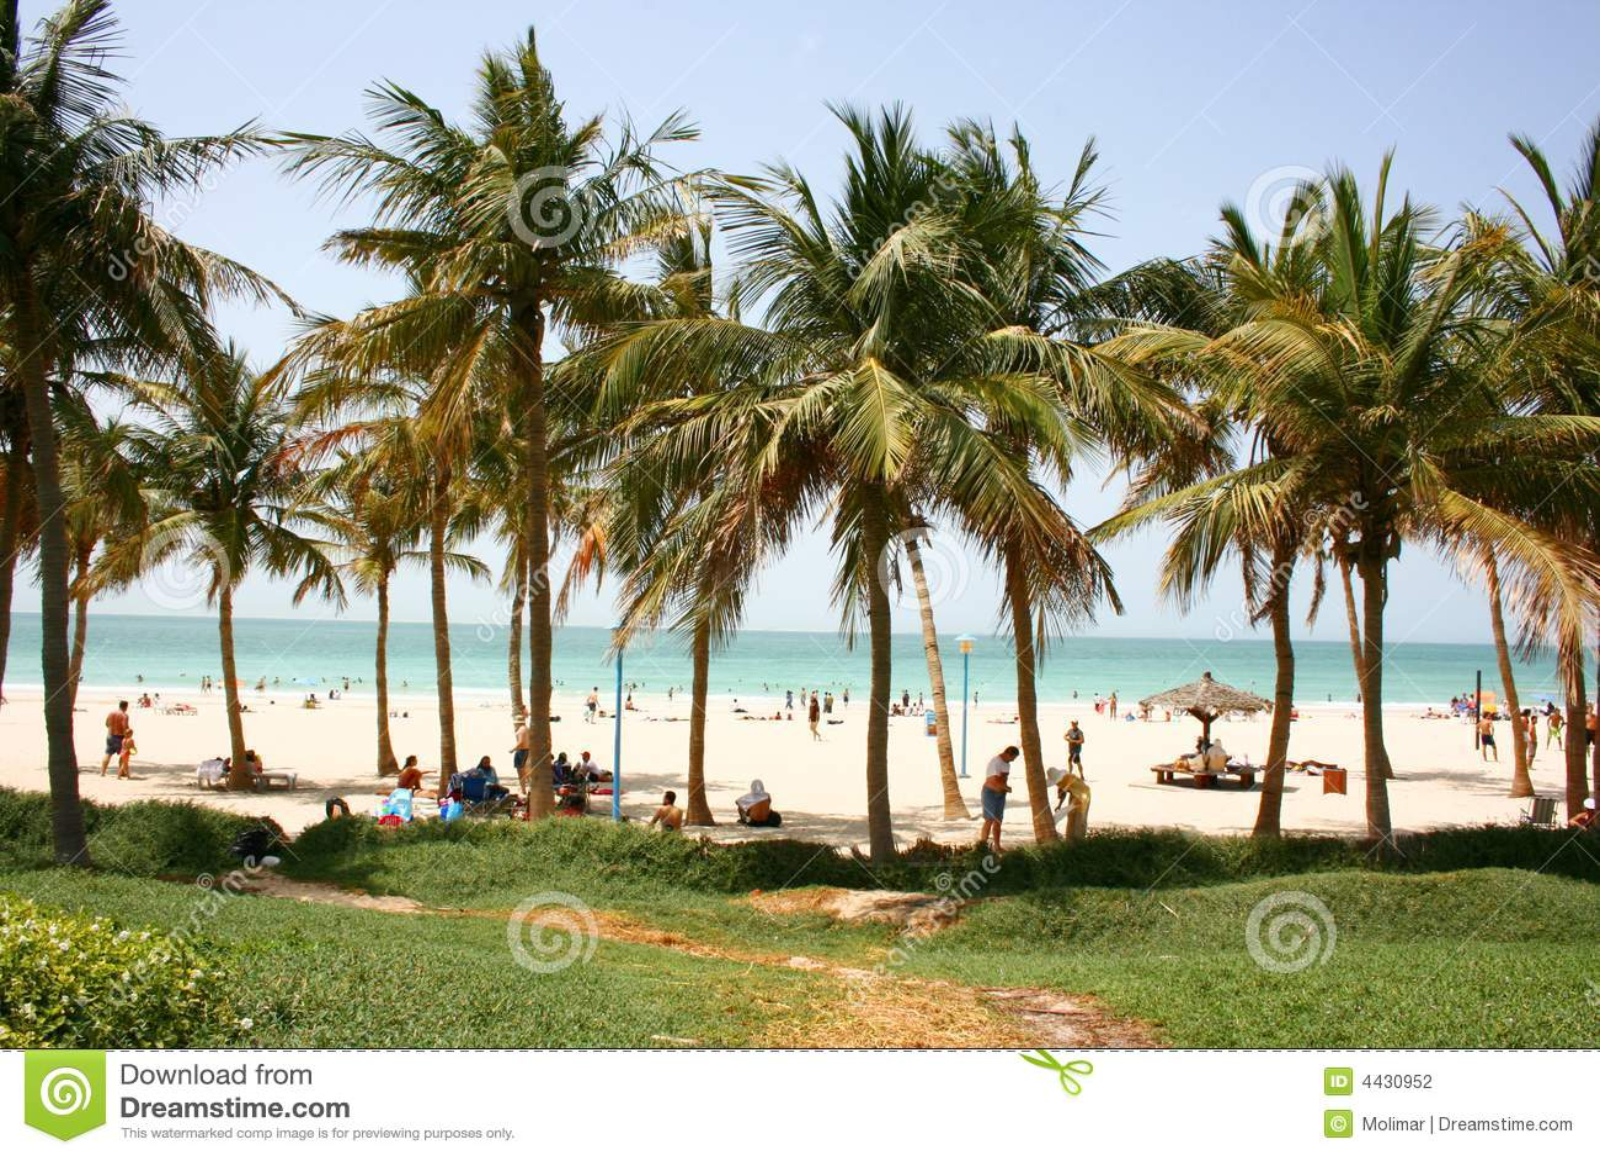 ... , middle east, united arab emirates, sea, ocean, jumeirah beach park